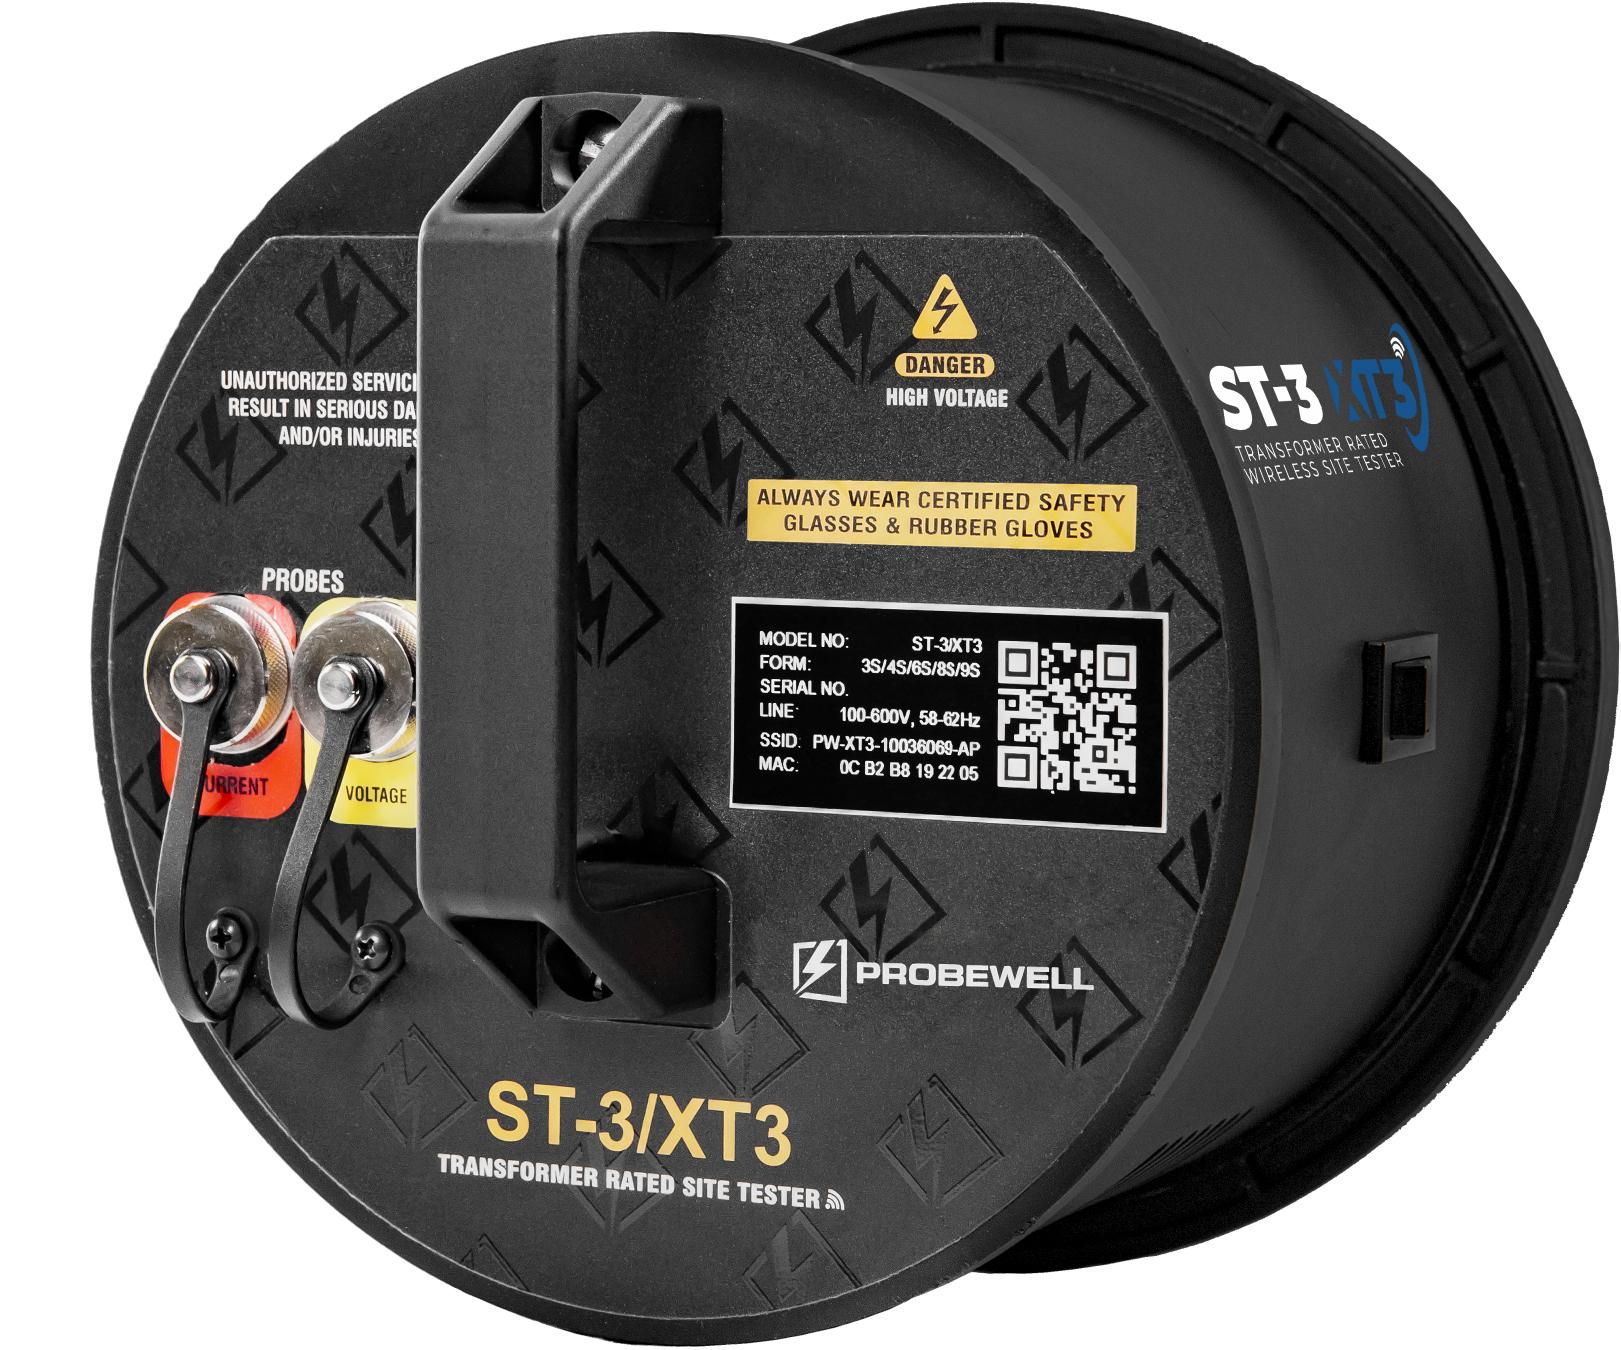 Probewell | Site Tester | ST-2/XT3